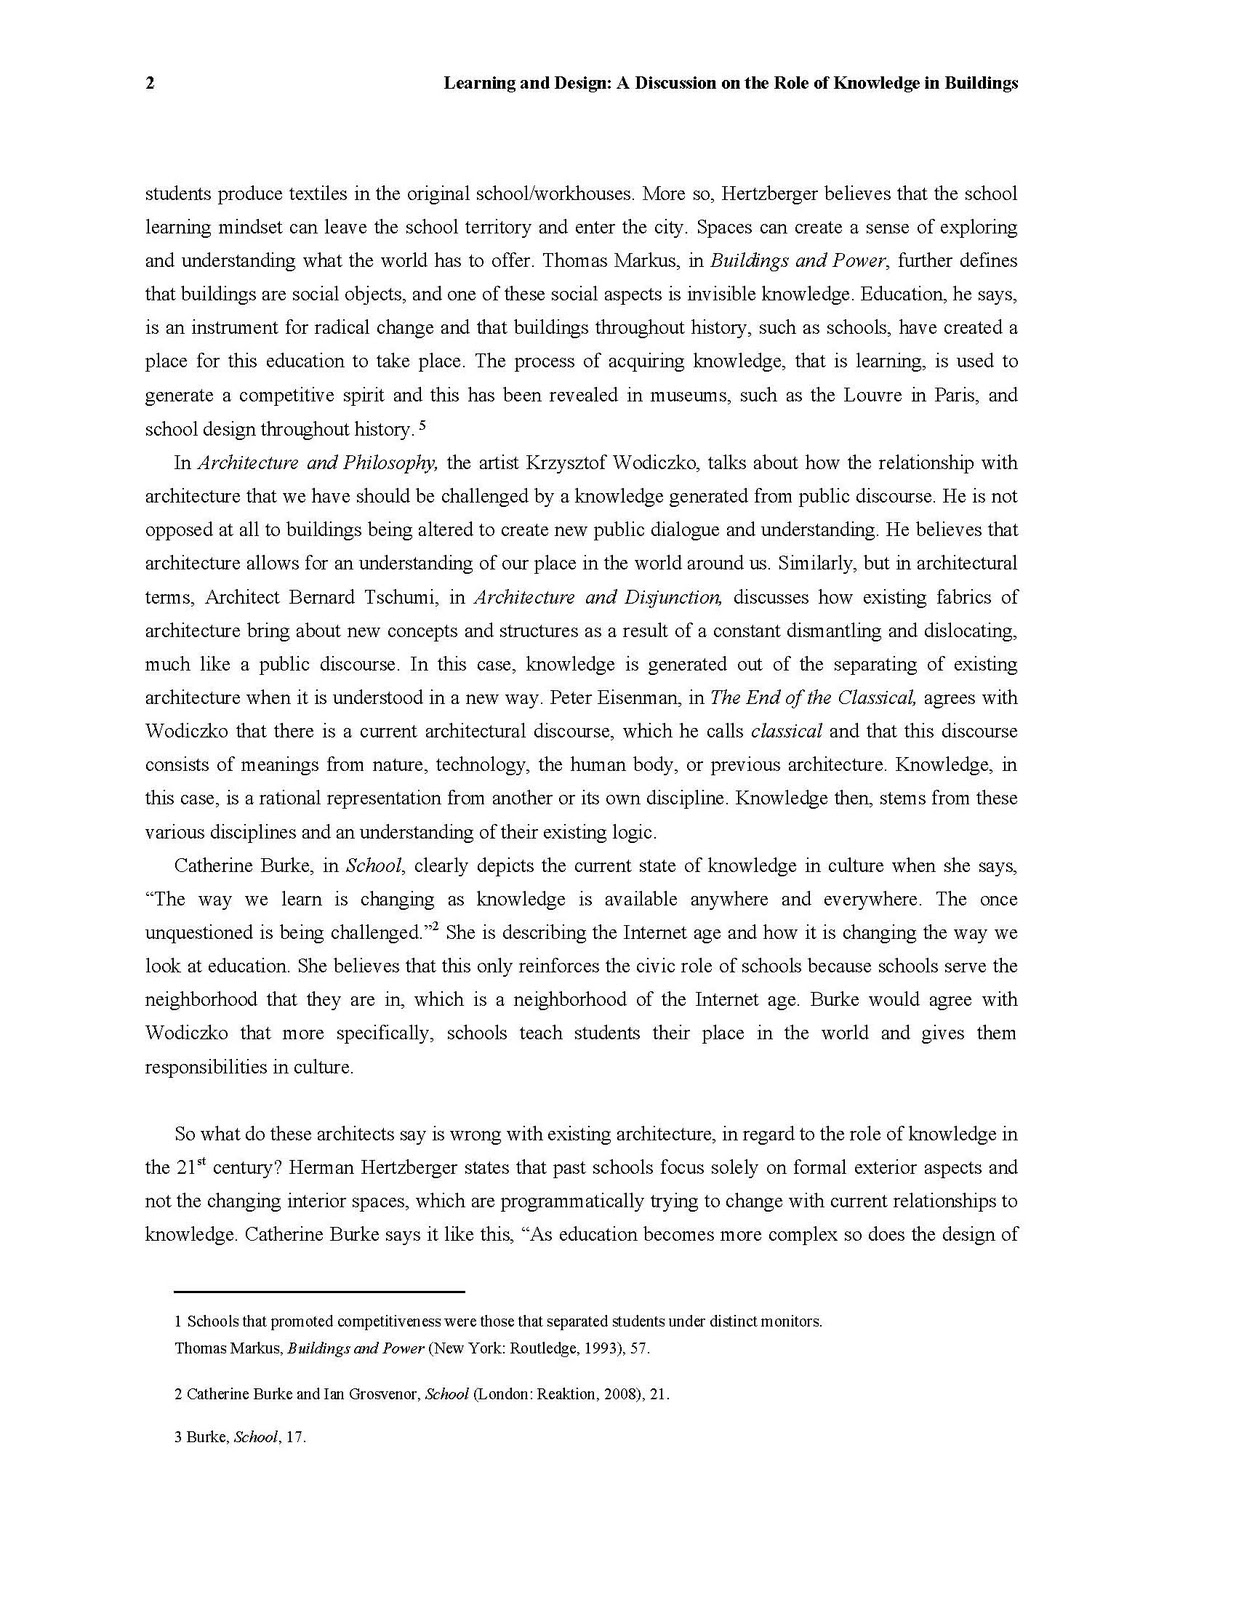 015 Bibliogahhic20essay Page 2 Paragraph Essay Sample Stirring 5 Example High School Pdf Argumentative Outline Template Five Full